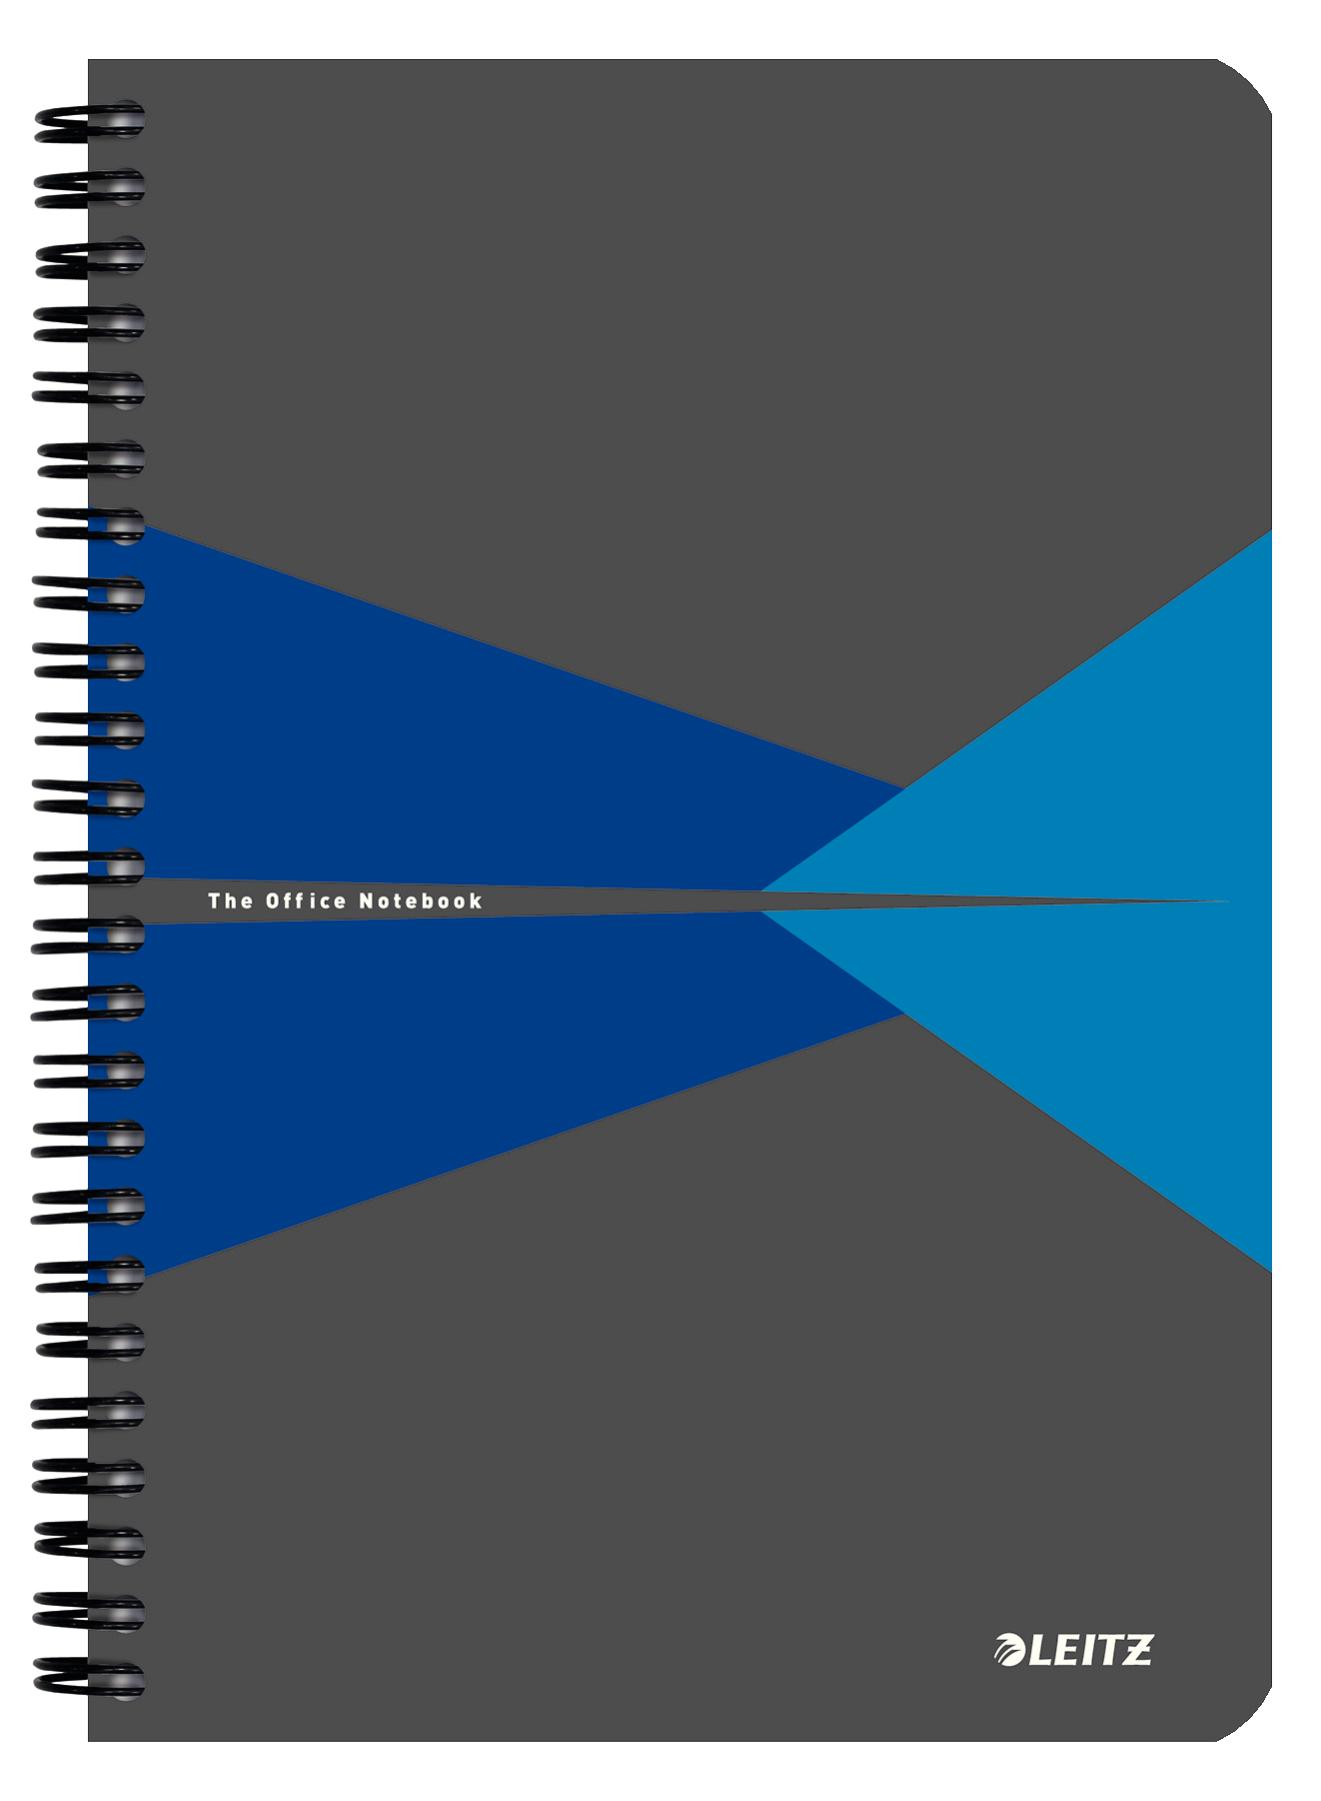 Caiet de birou LEITZ Office, carton, A5, cu spira, dictando - albastru